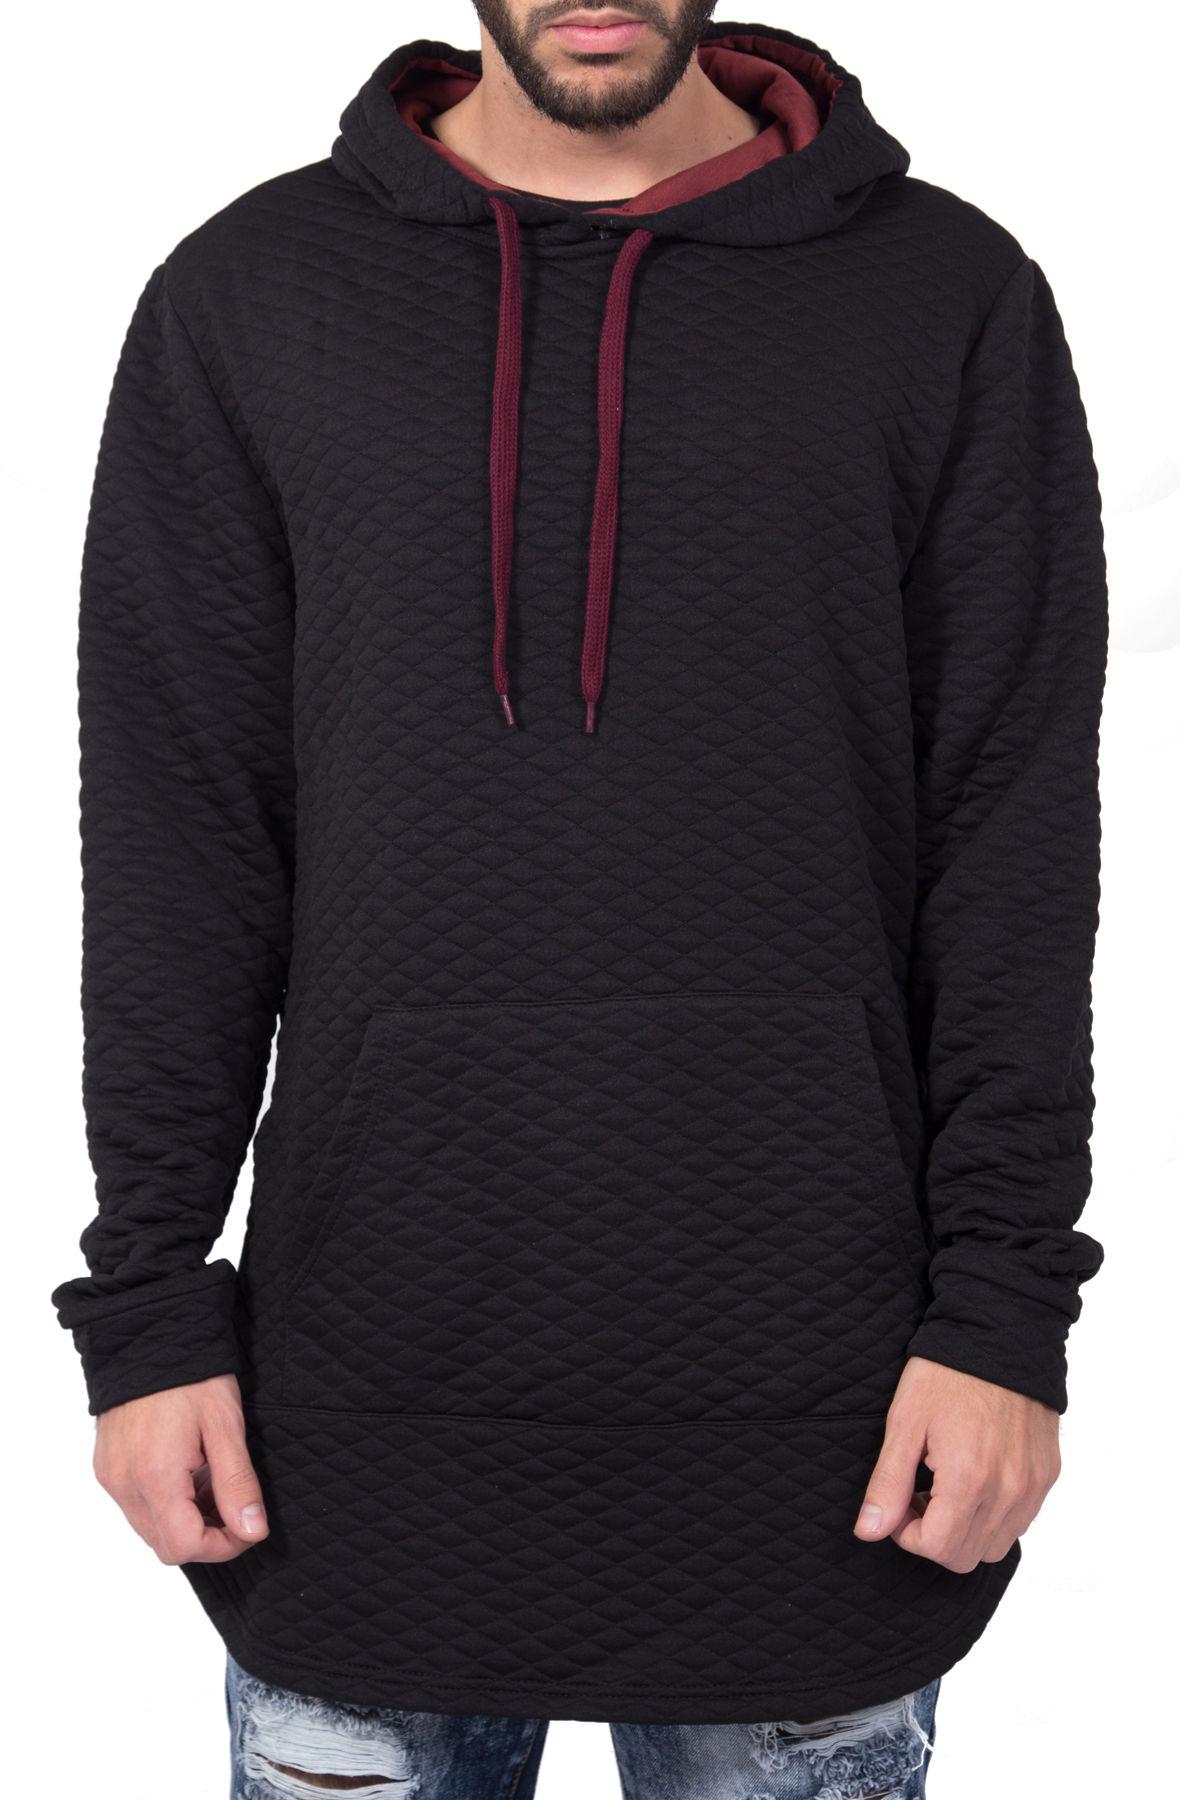 Image of Quilted Zipper Hoodie in Black